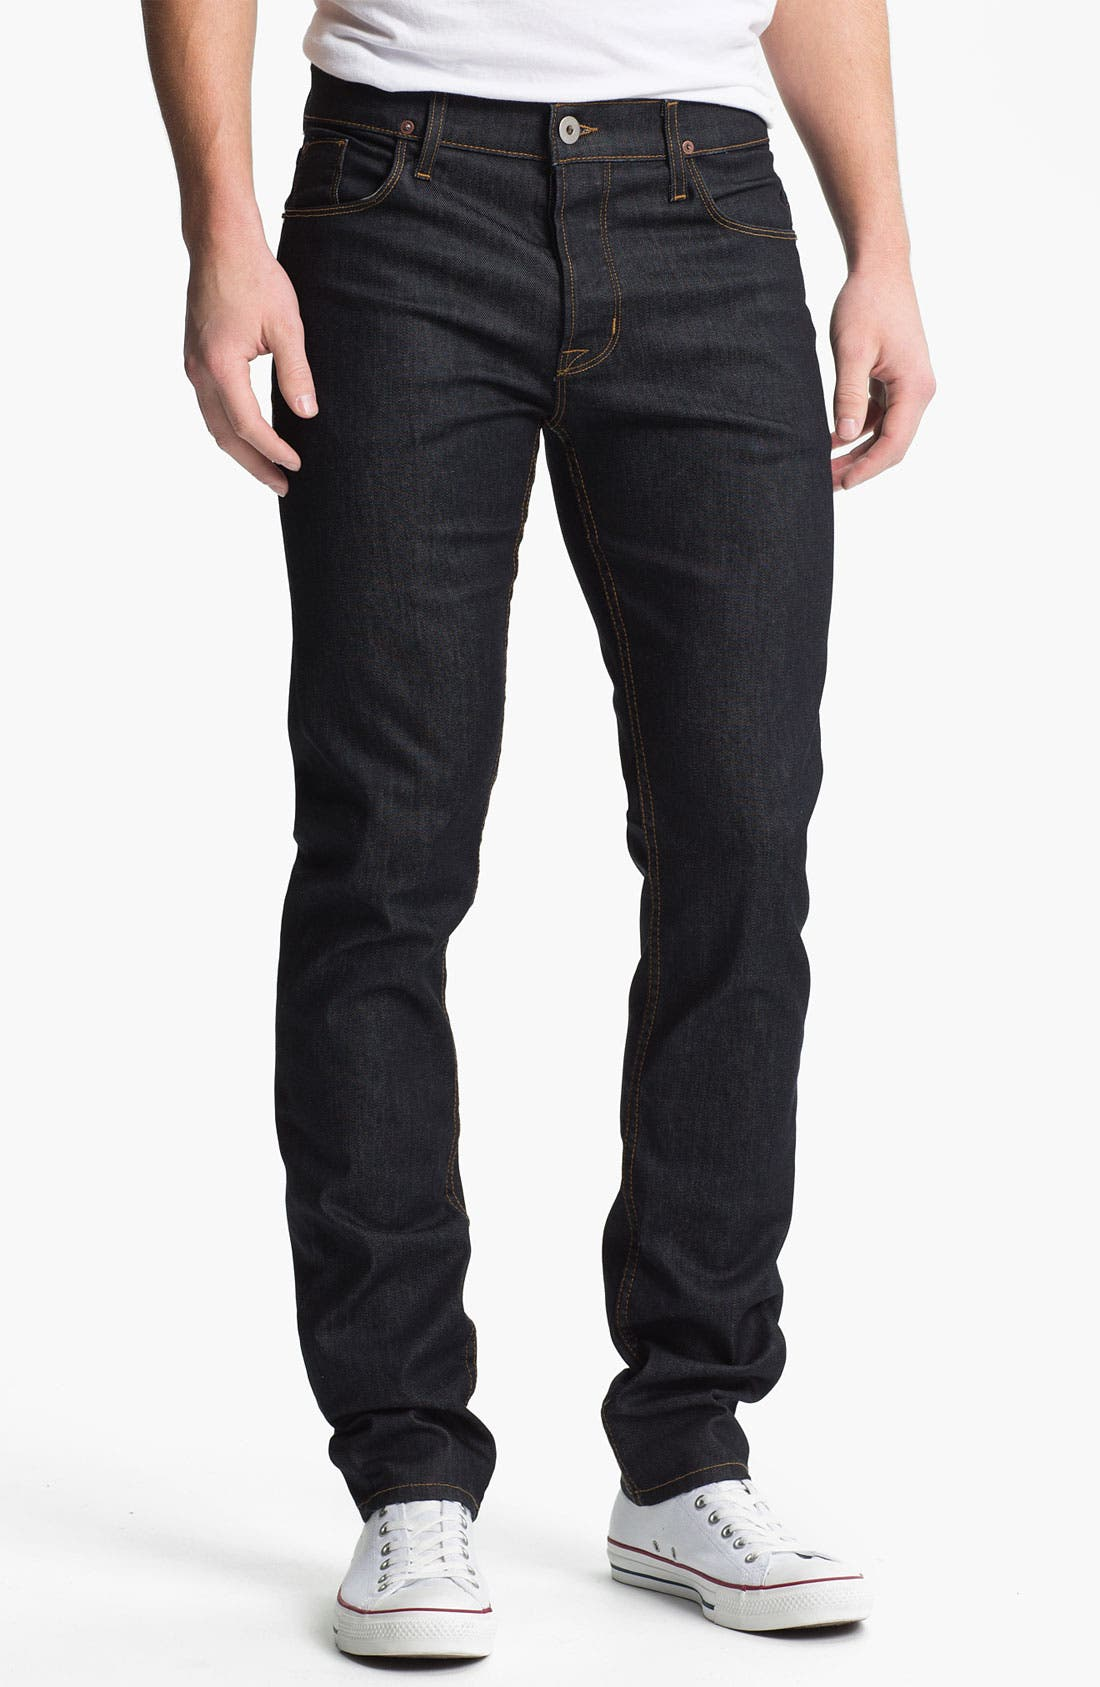 Main Image - Hudson Jeans 'Sartor' Skinny Fit Jeans (Edges)